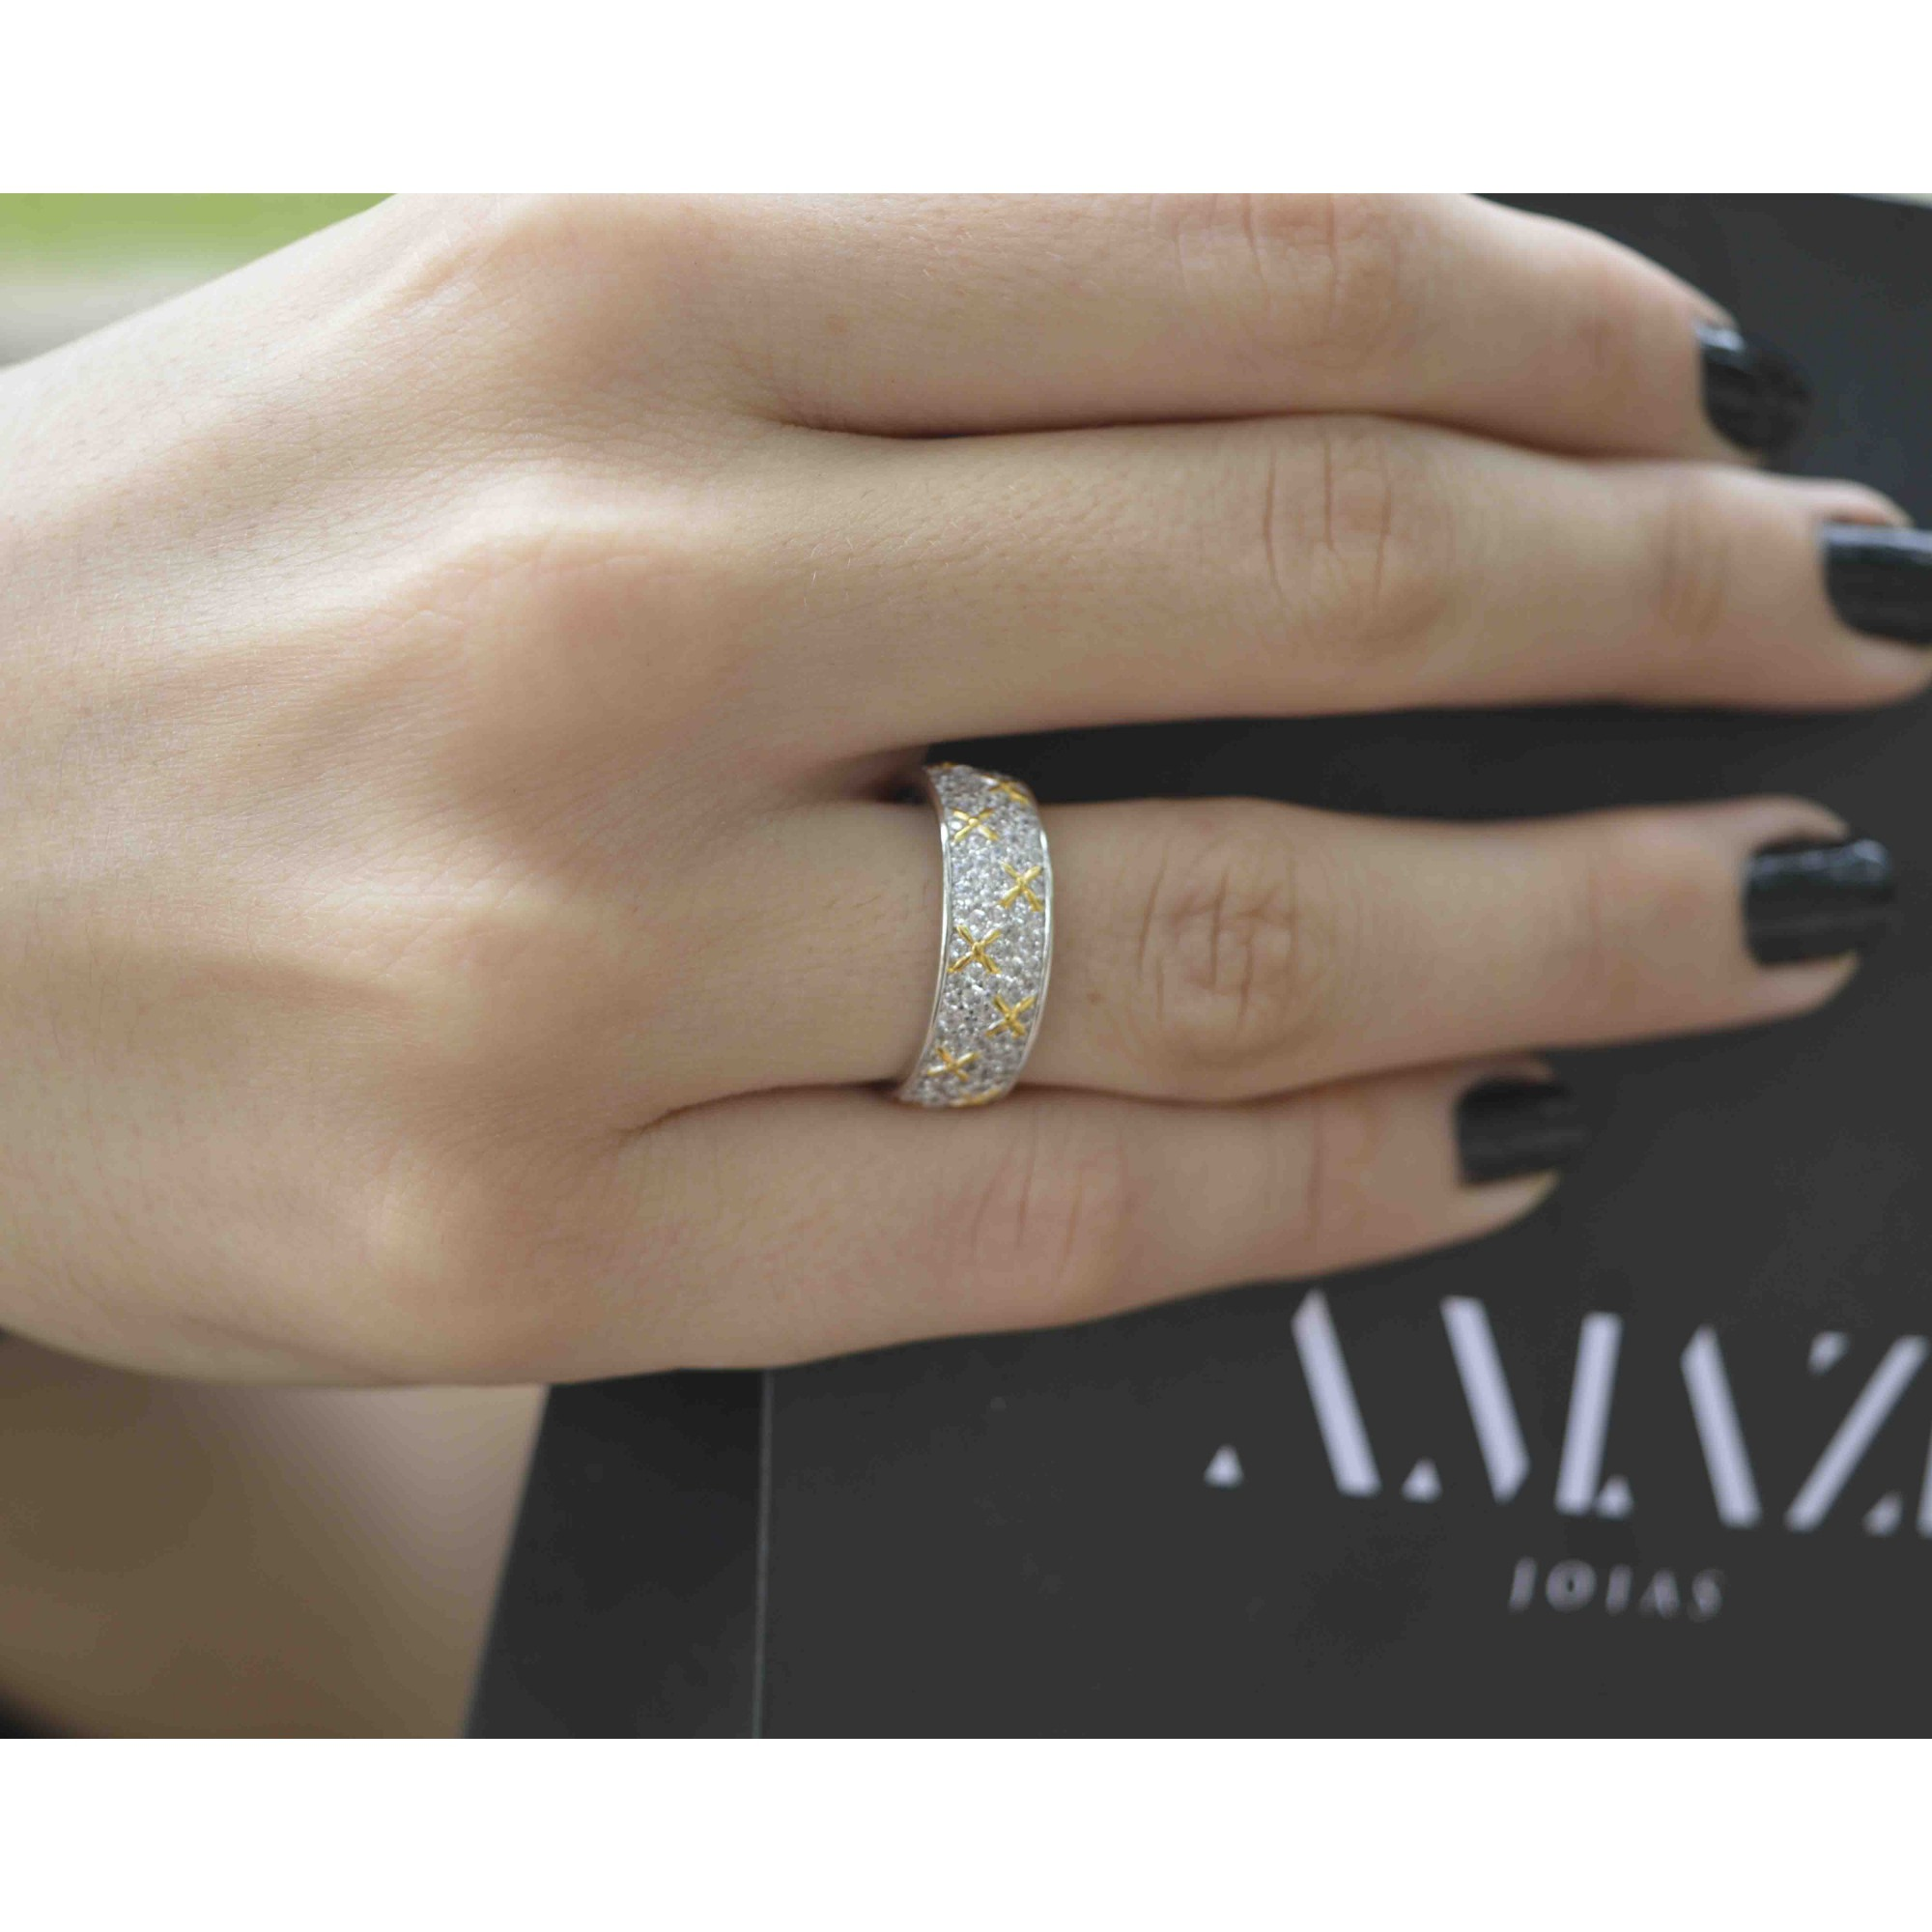 Anel Feminino Prata 925 Zirconias Luxo